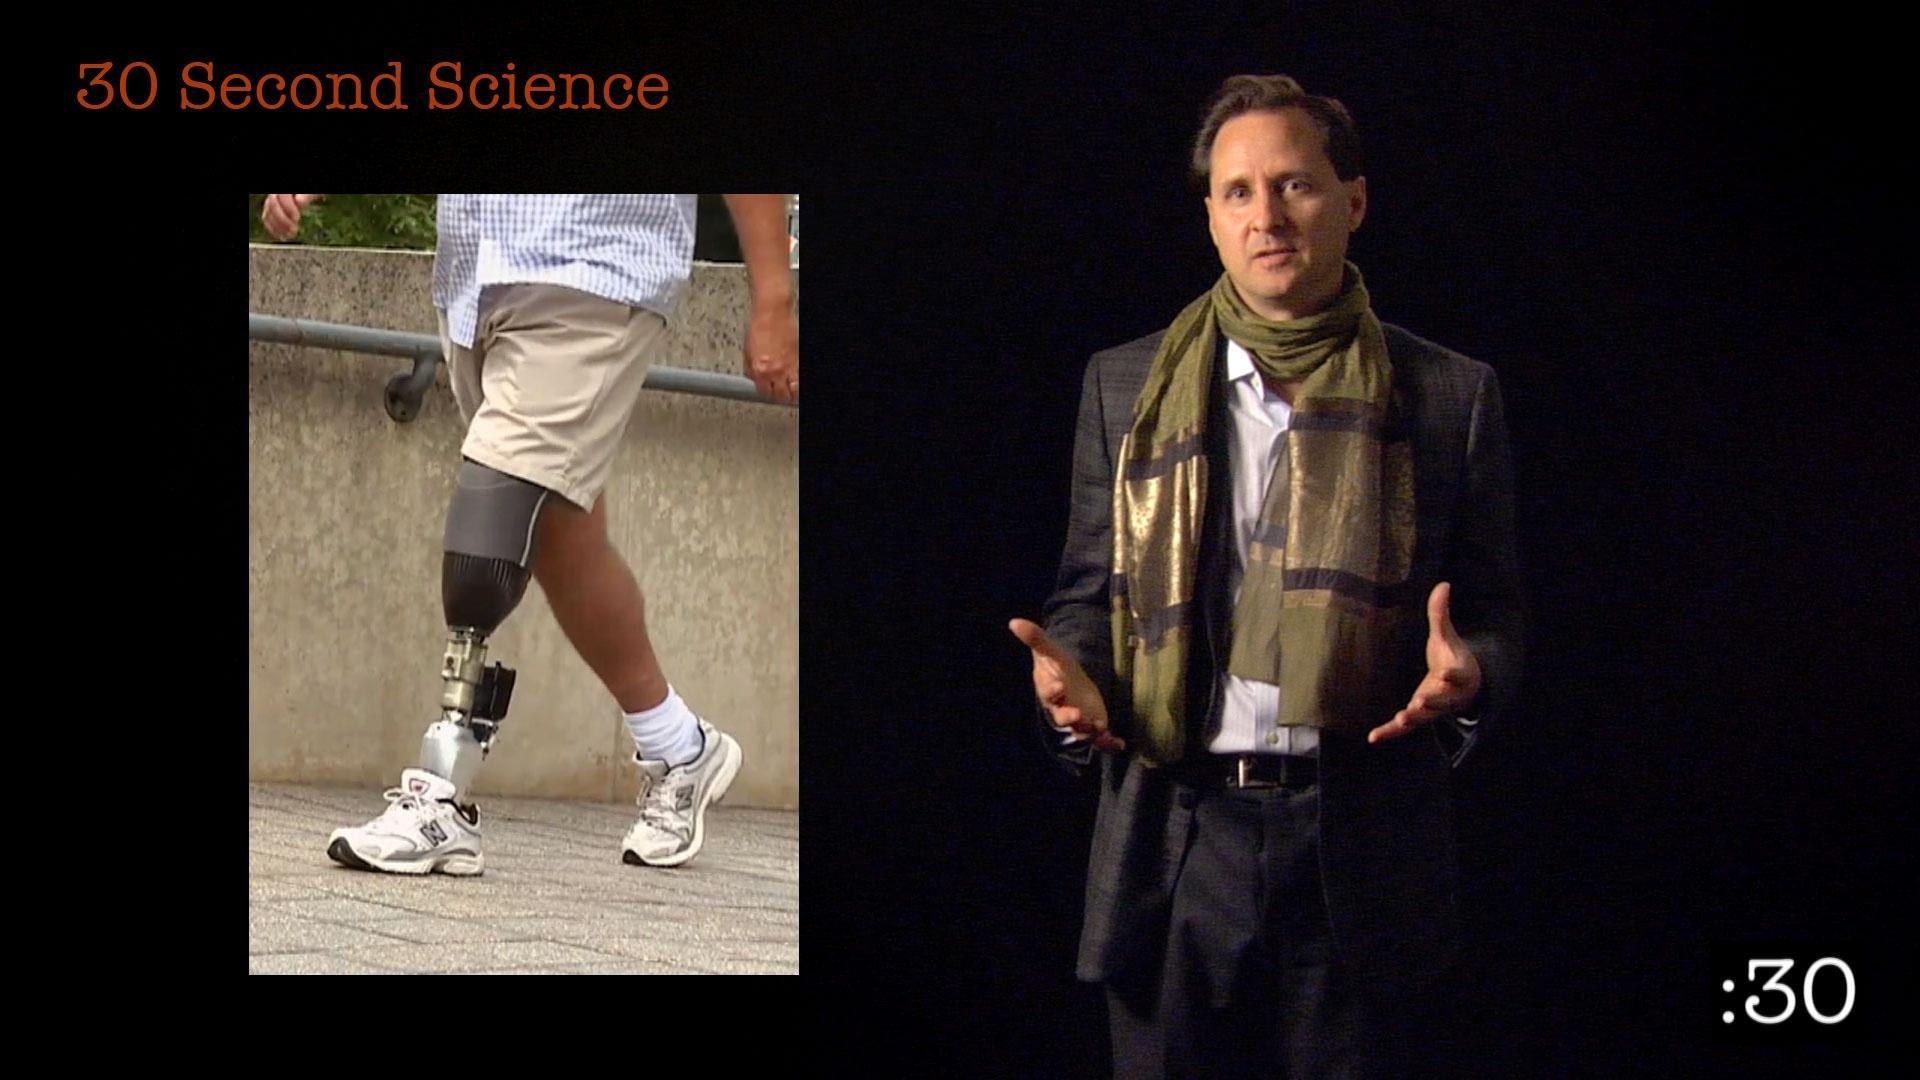 30 Second Science: Hugh Herr image